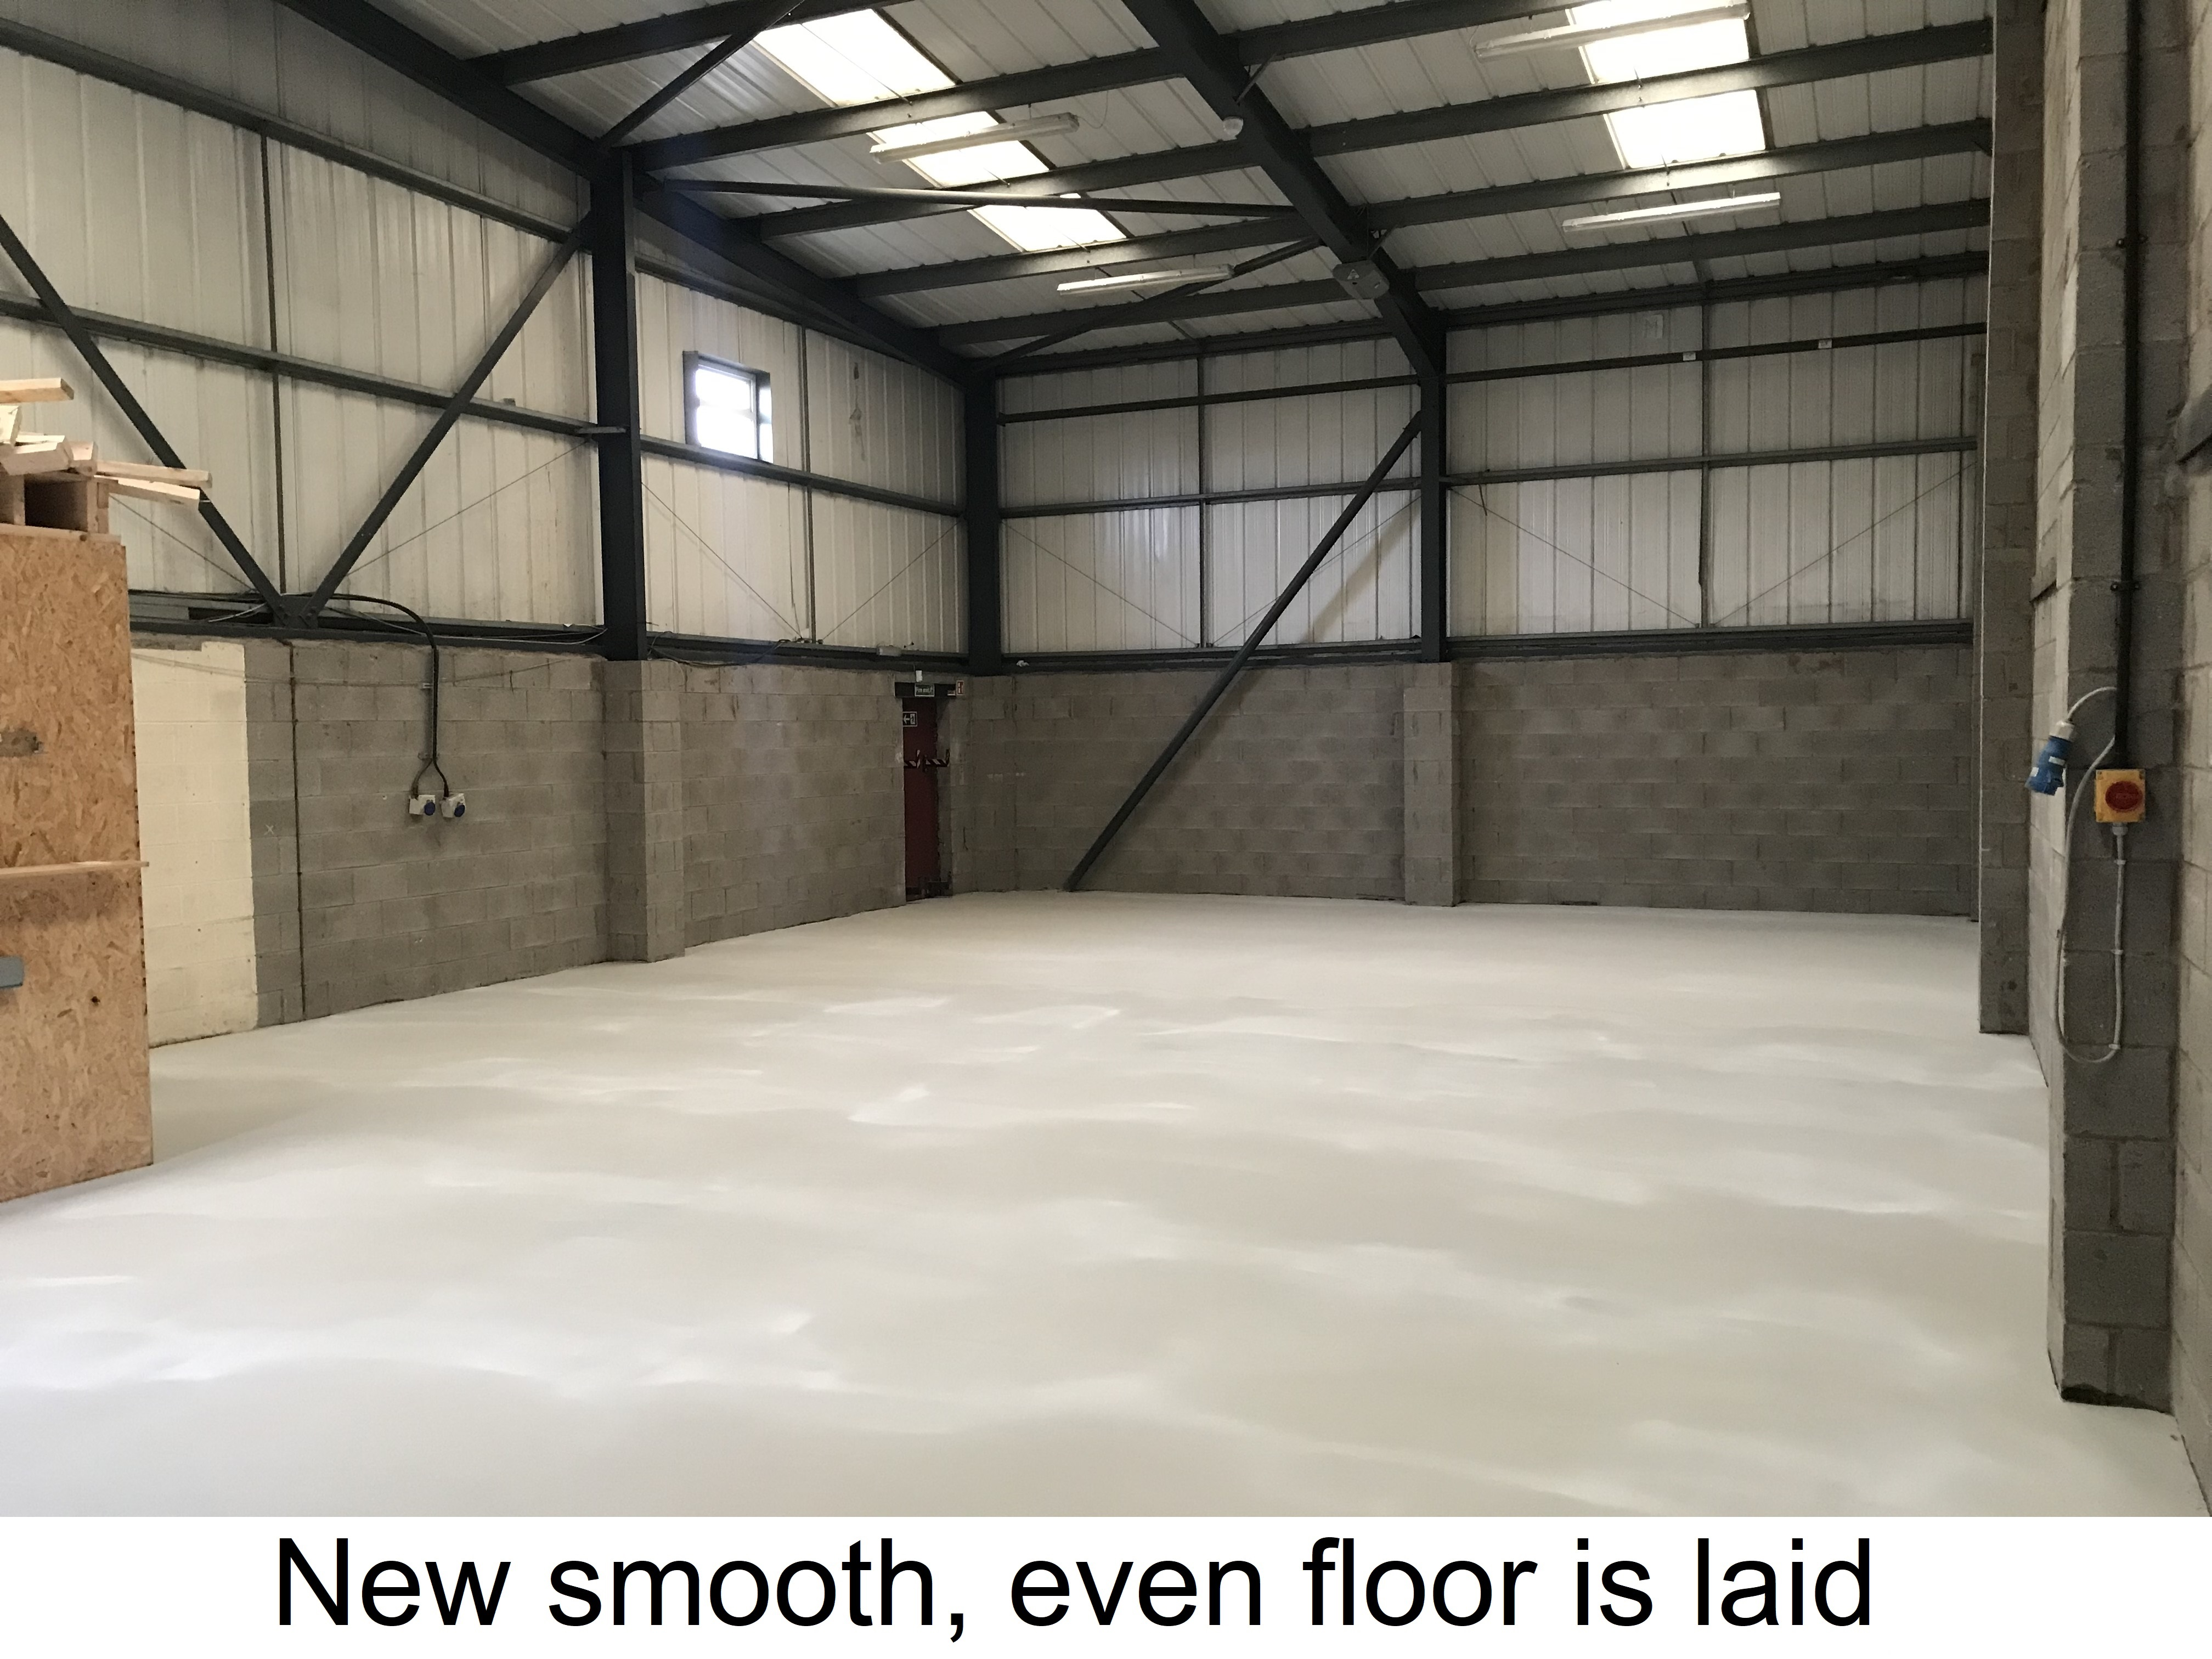 https://0201.nccdn.net/1_2/000/000/0bd/fa3/5.-new-smooth--even-floor-is-laid.jpg